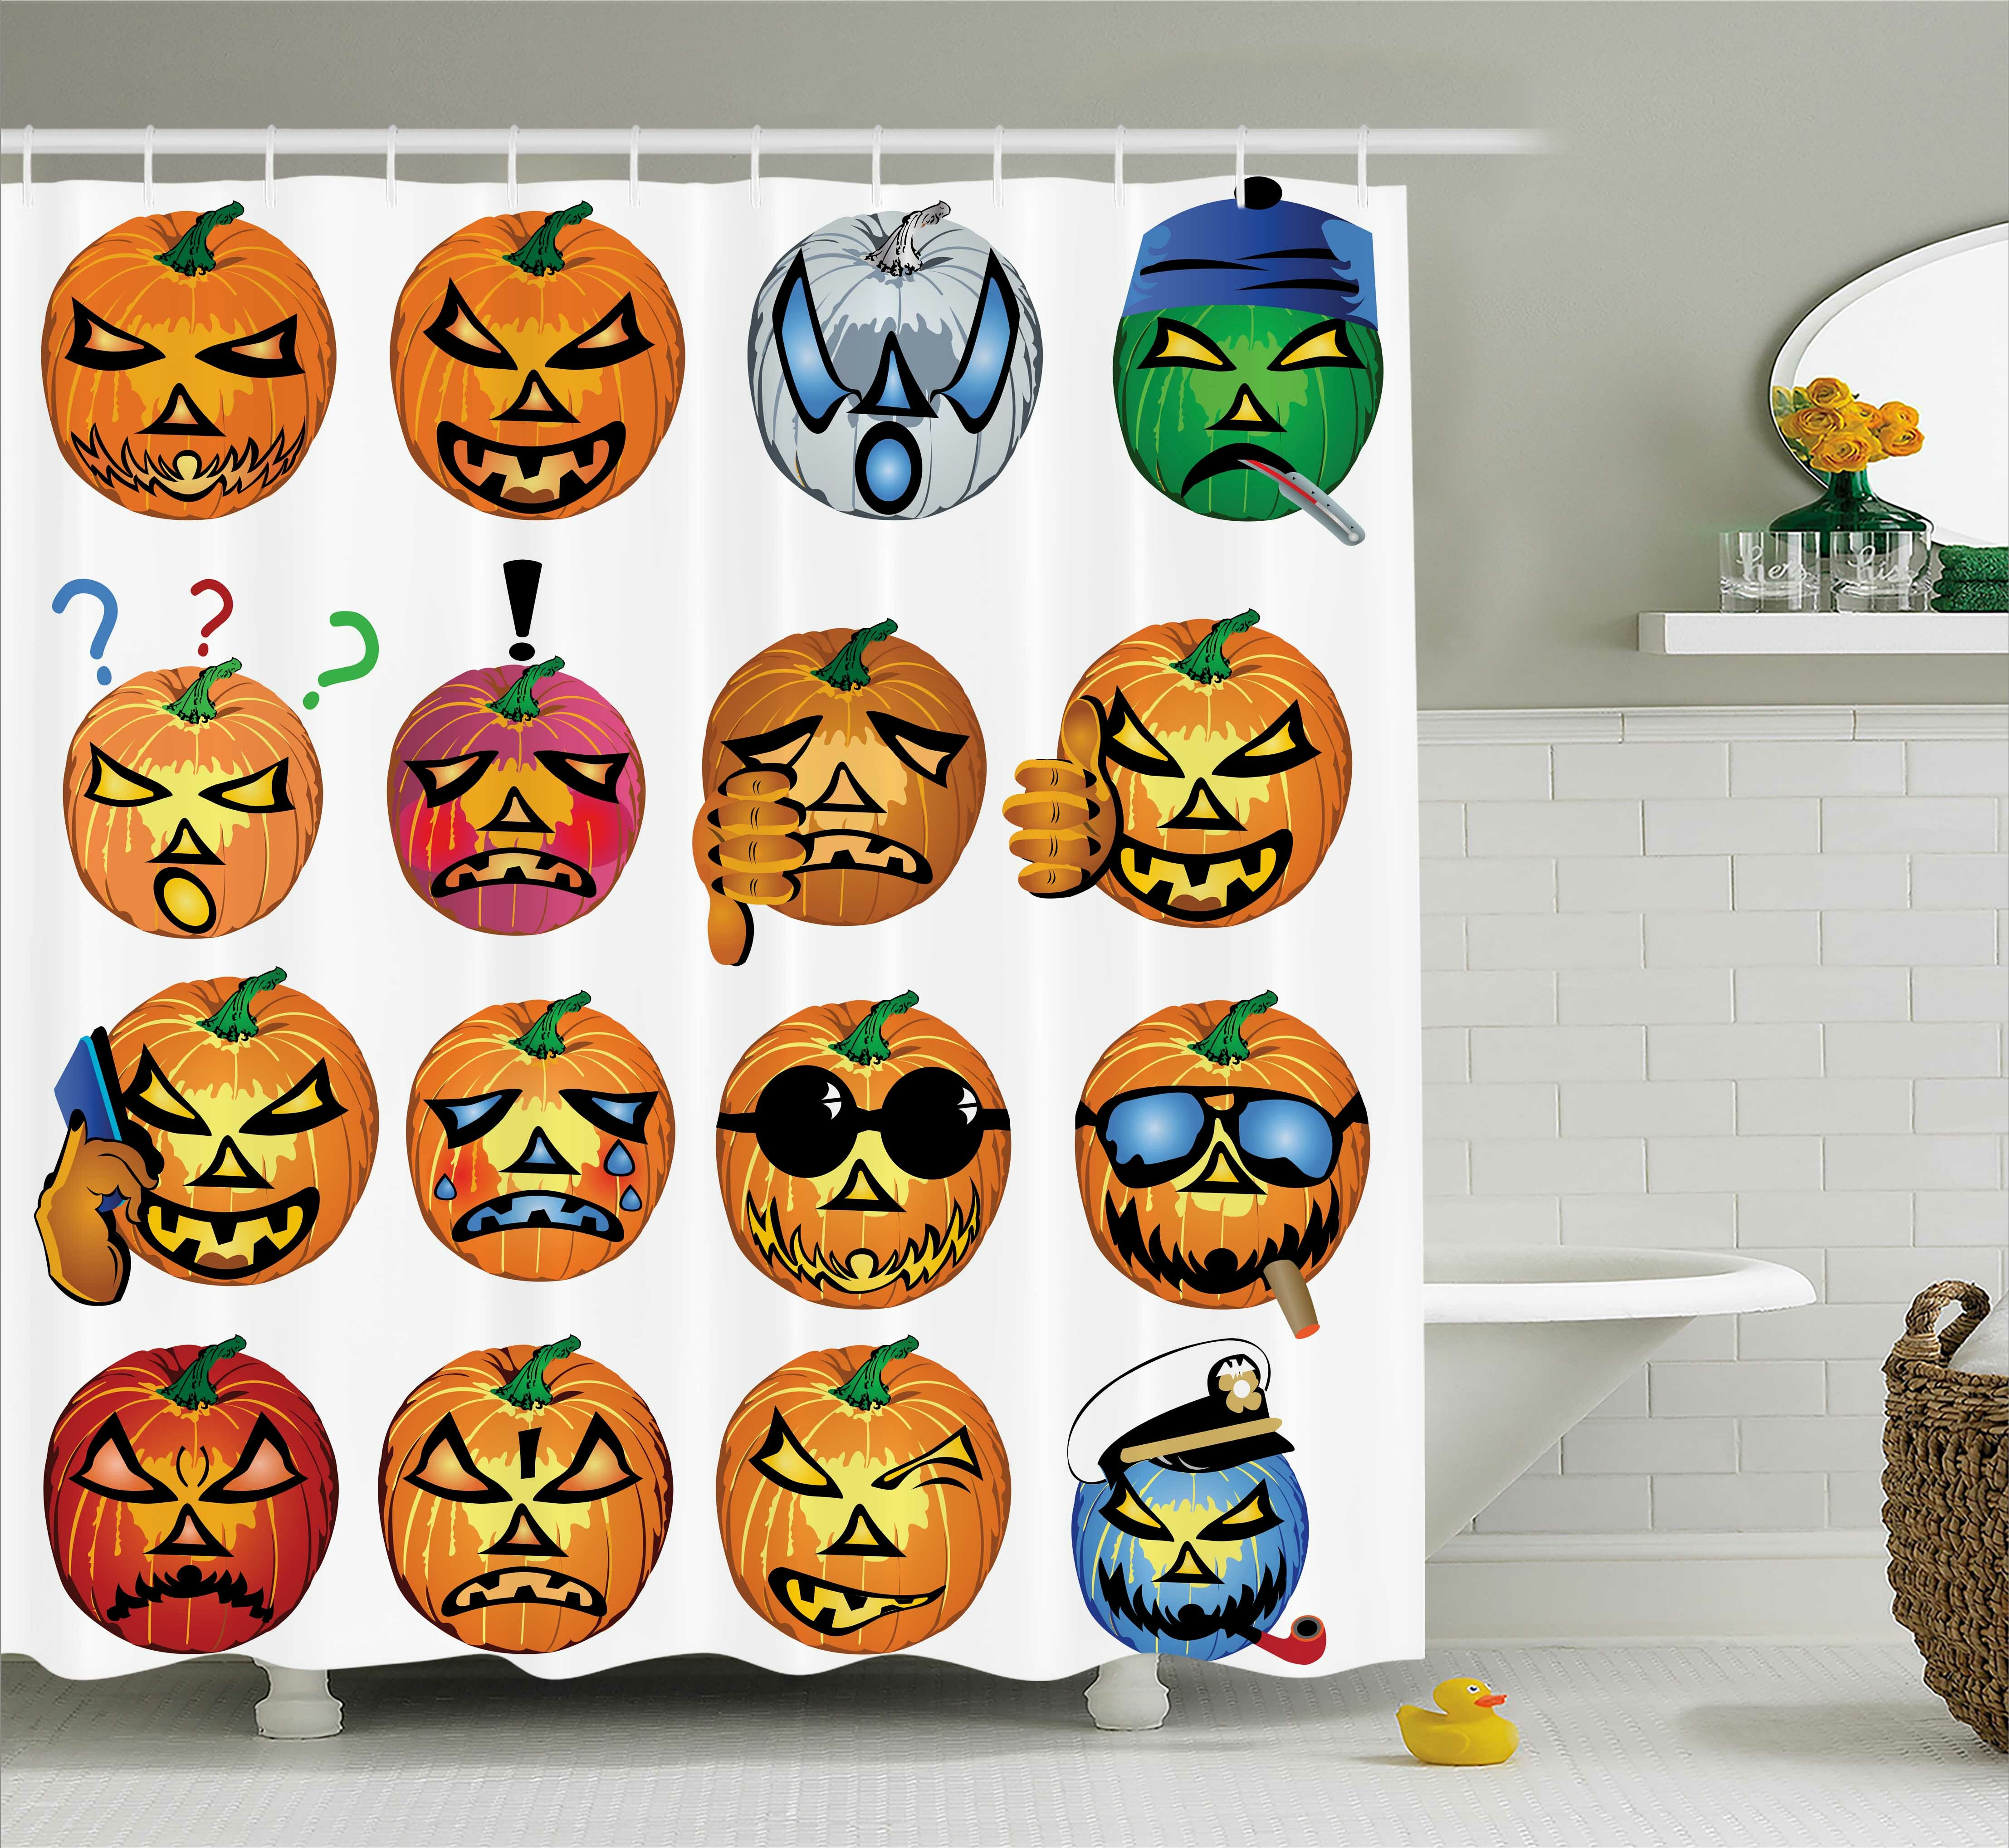 The Holiday Aisle Halloween Decor Pumpkin Emoji Shower Curtain